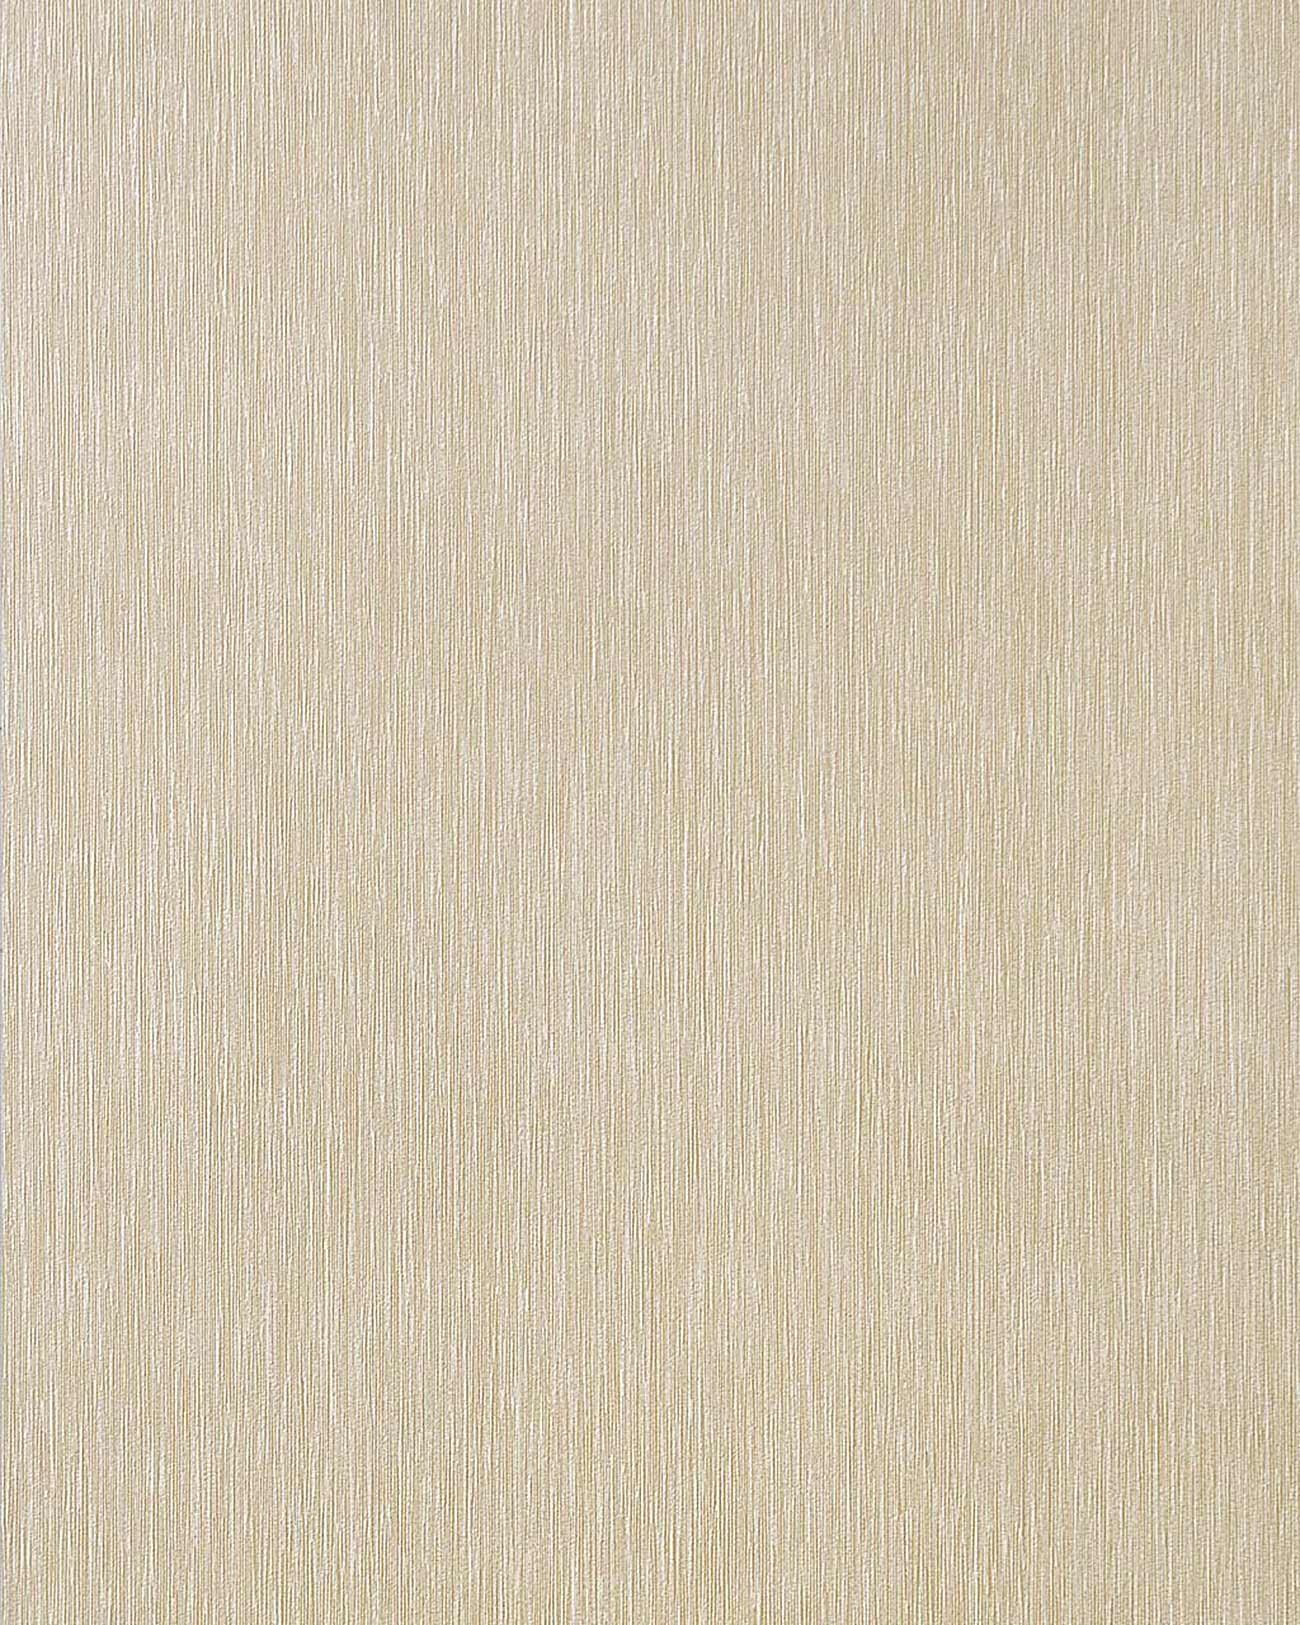 edem 141 04 elegante uni tapete leicht gestreift karamell hell braun perlmutt original edem. Black Bedroom Furniture Sets. Home Design Ideas